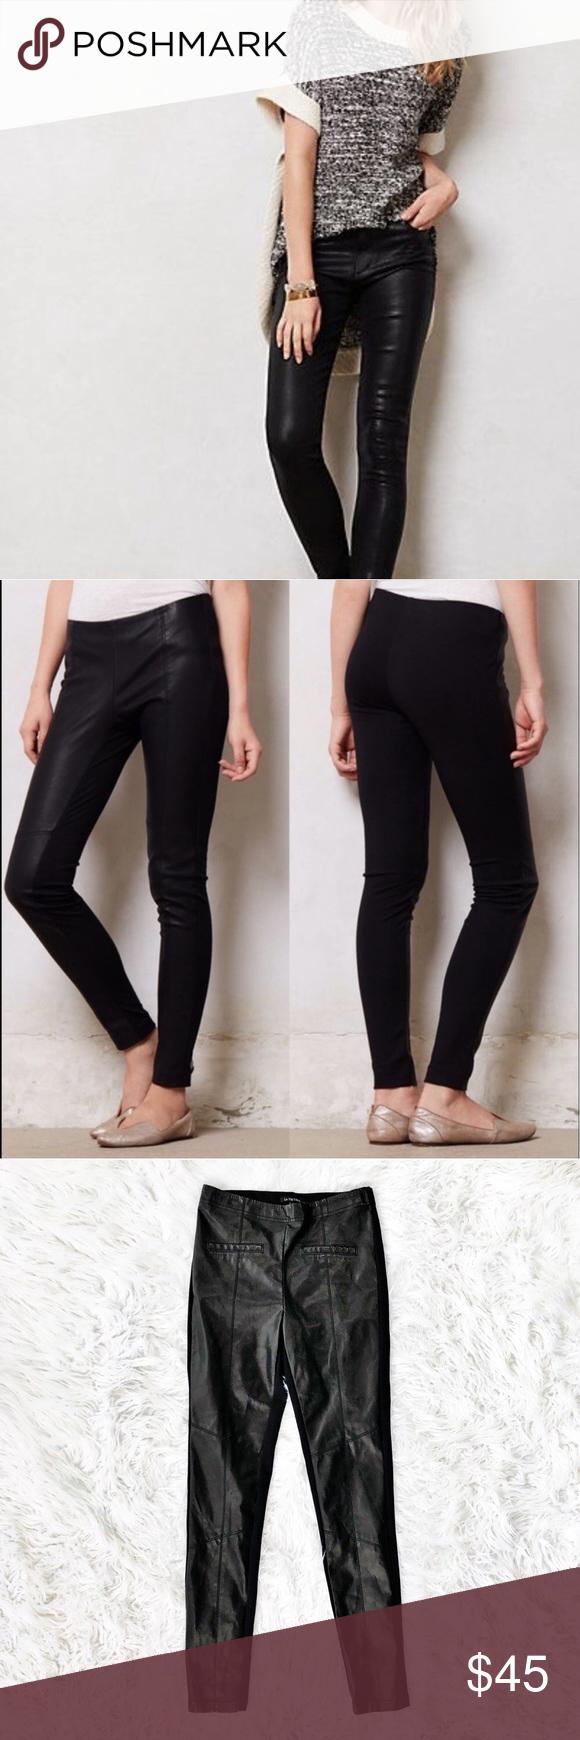 95241fd09a1c31 Anthropologie La Fee Verte vegan leather leggings Vegan leather and ponte  leggings, size XS from